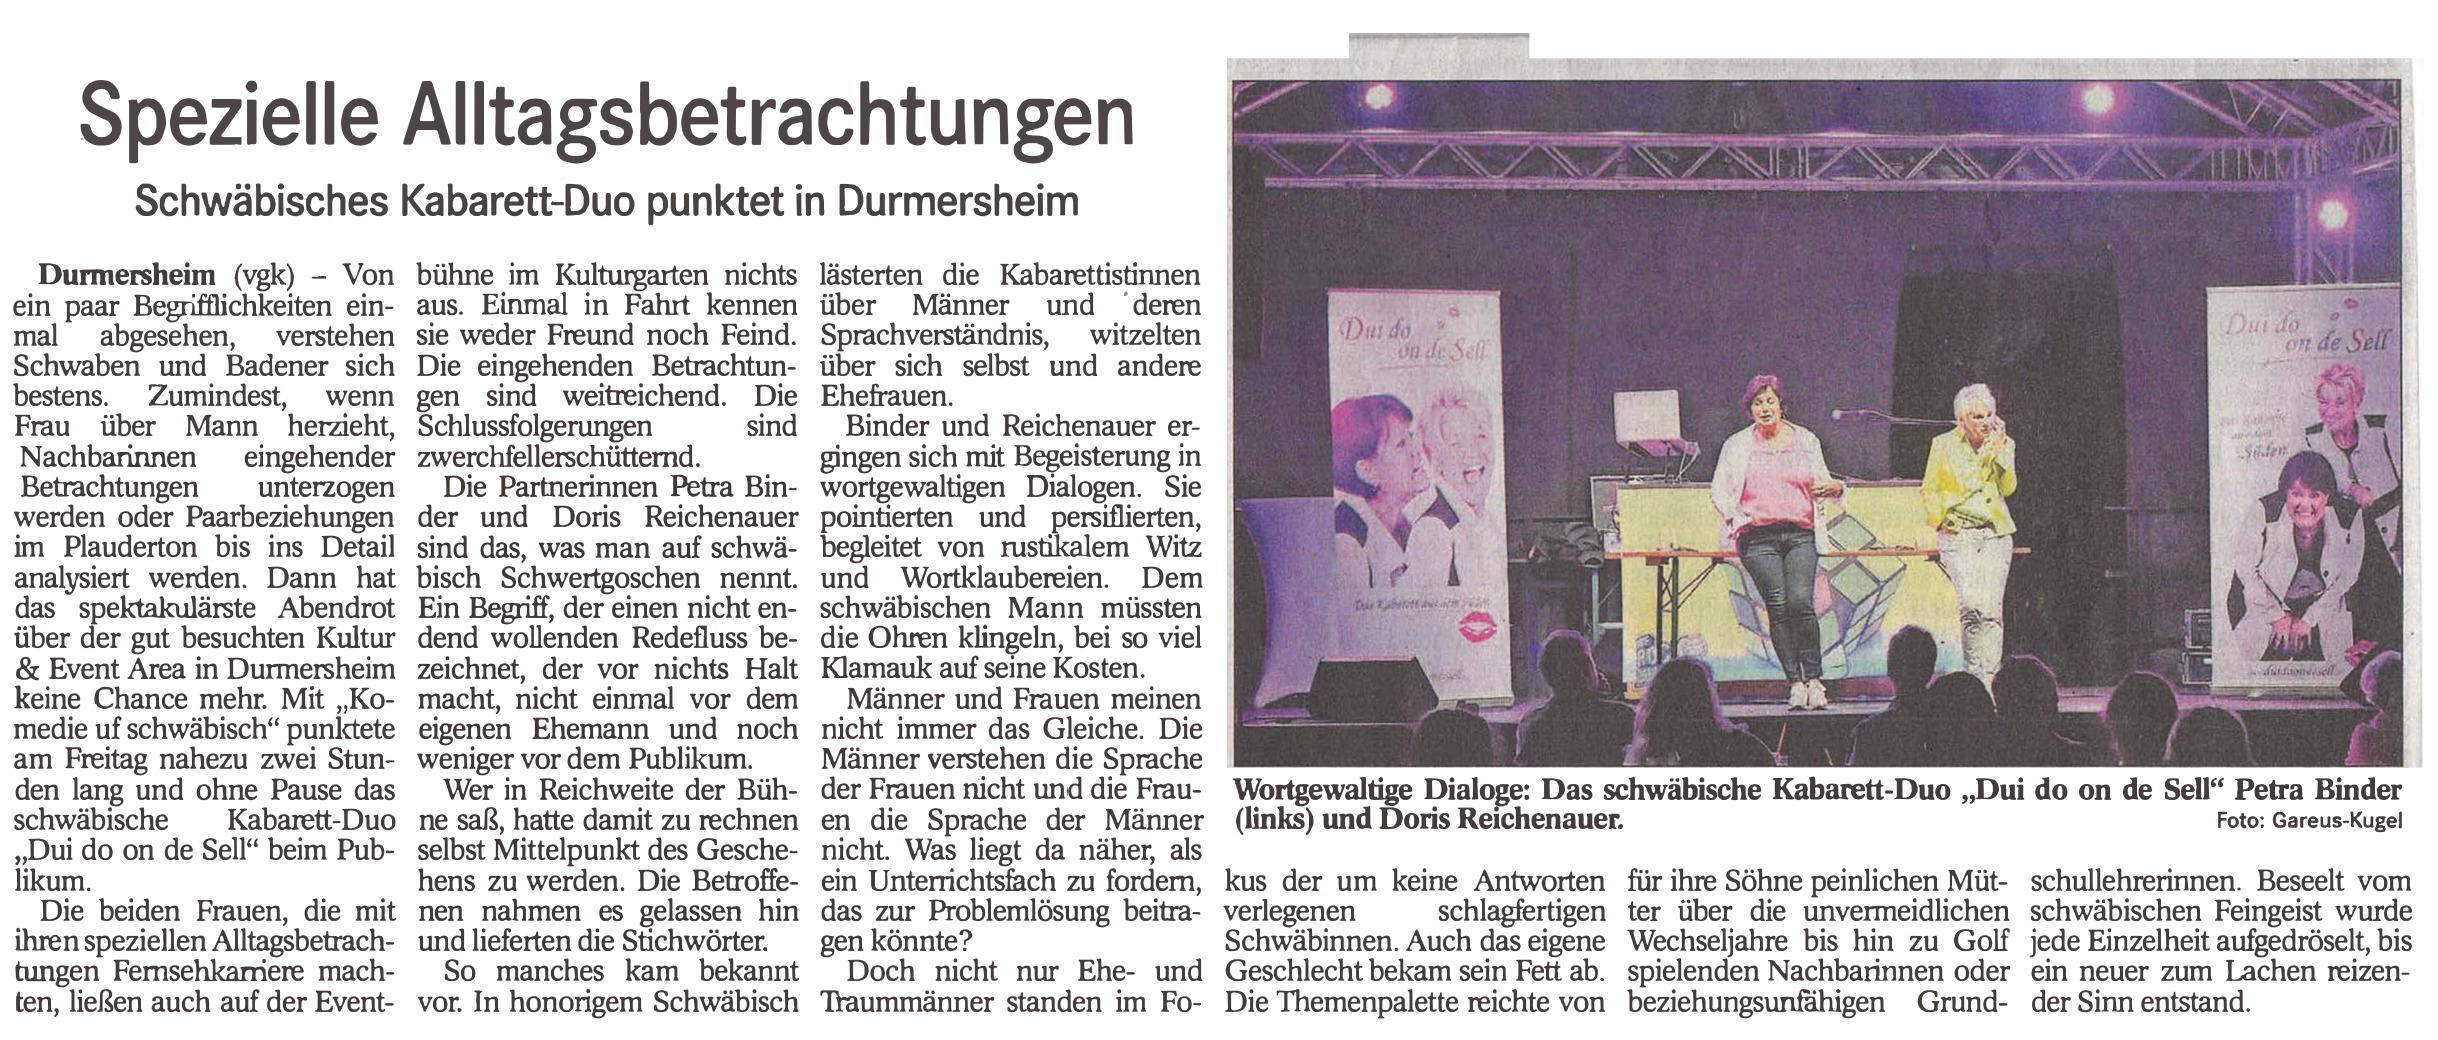 Kabarett-Duo - dui do on de sell - we-rock-durmersheim - 3p productions